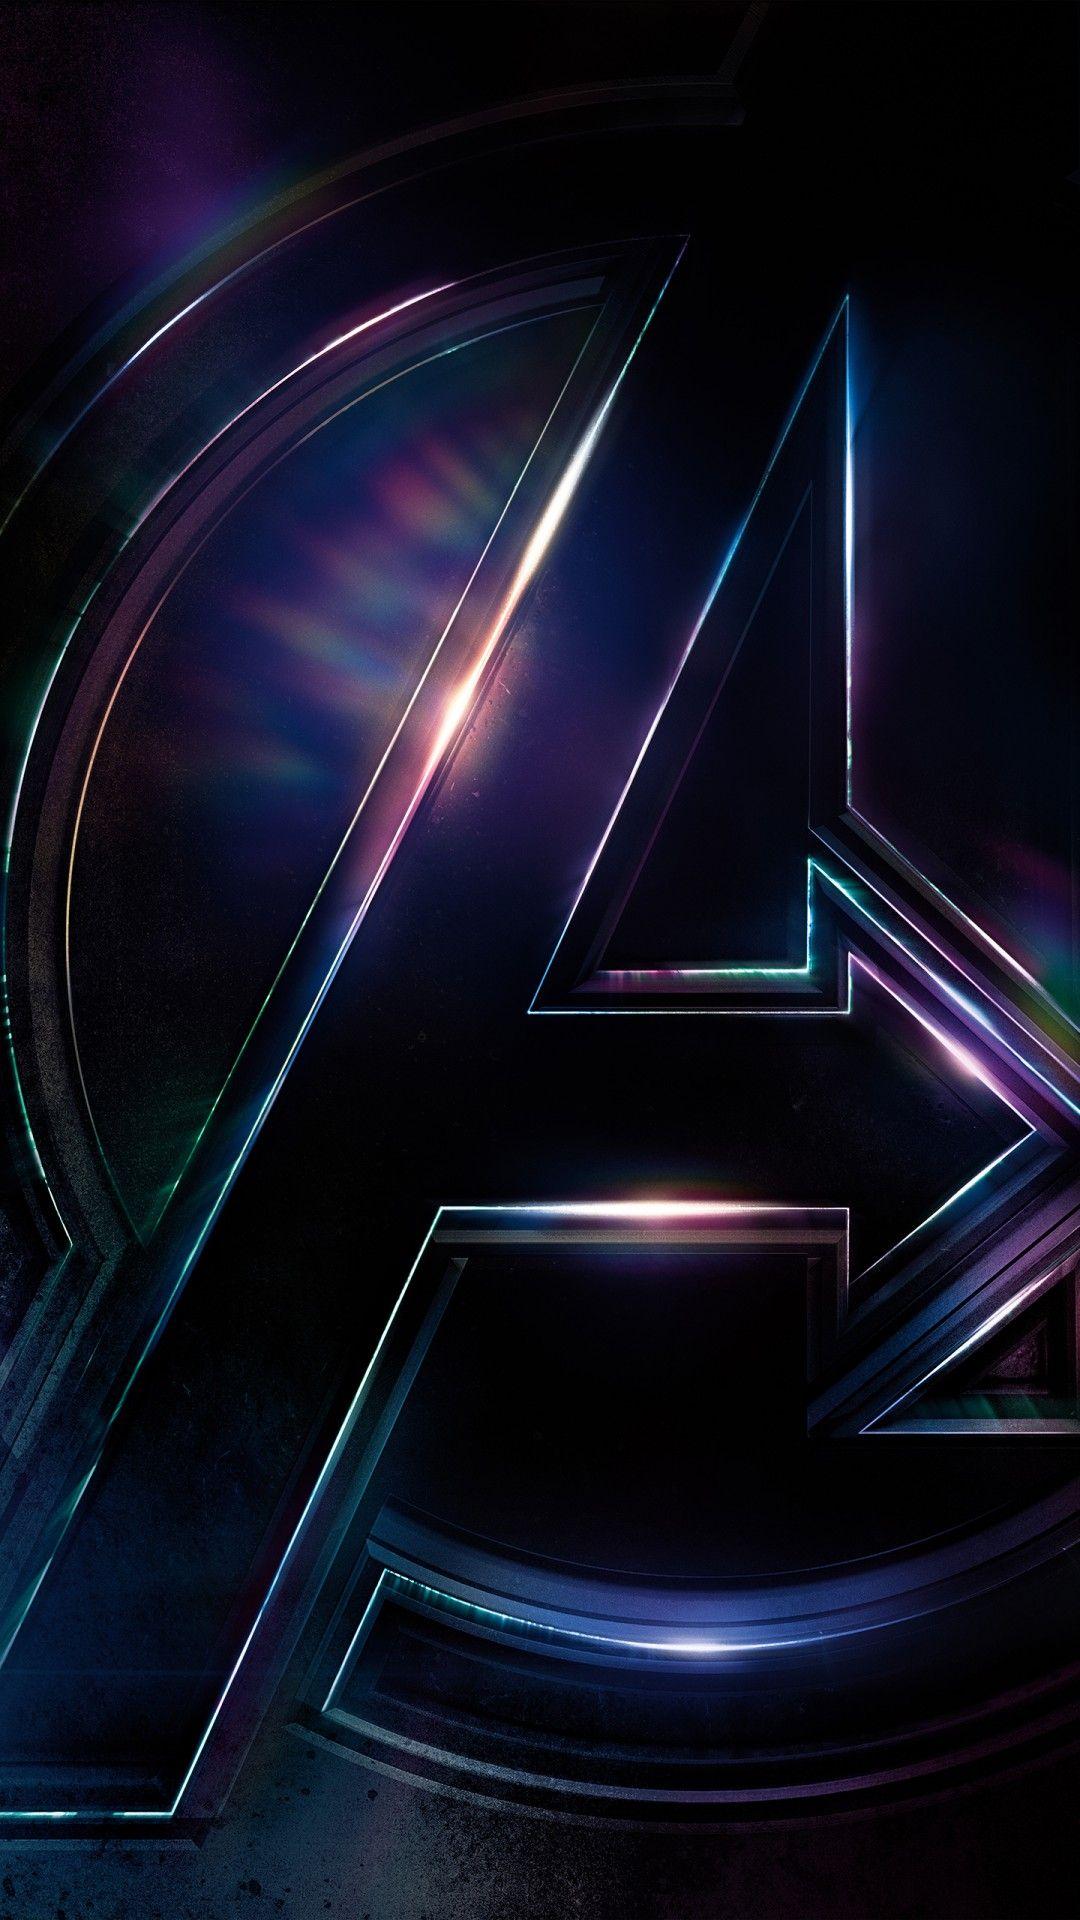 Avengers Infinity War Vf Streaming : avengers, infinity, streaming, Iphone, Wallpaper